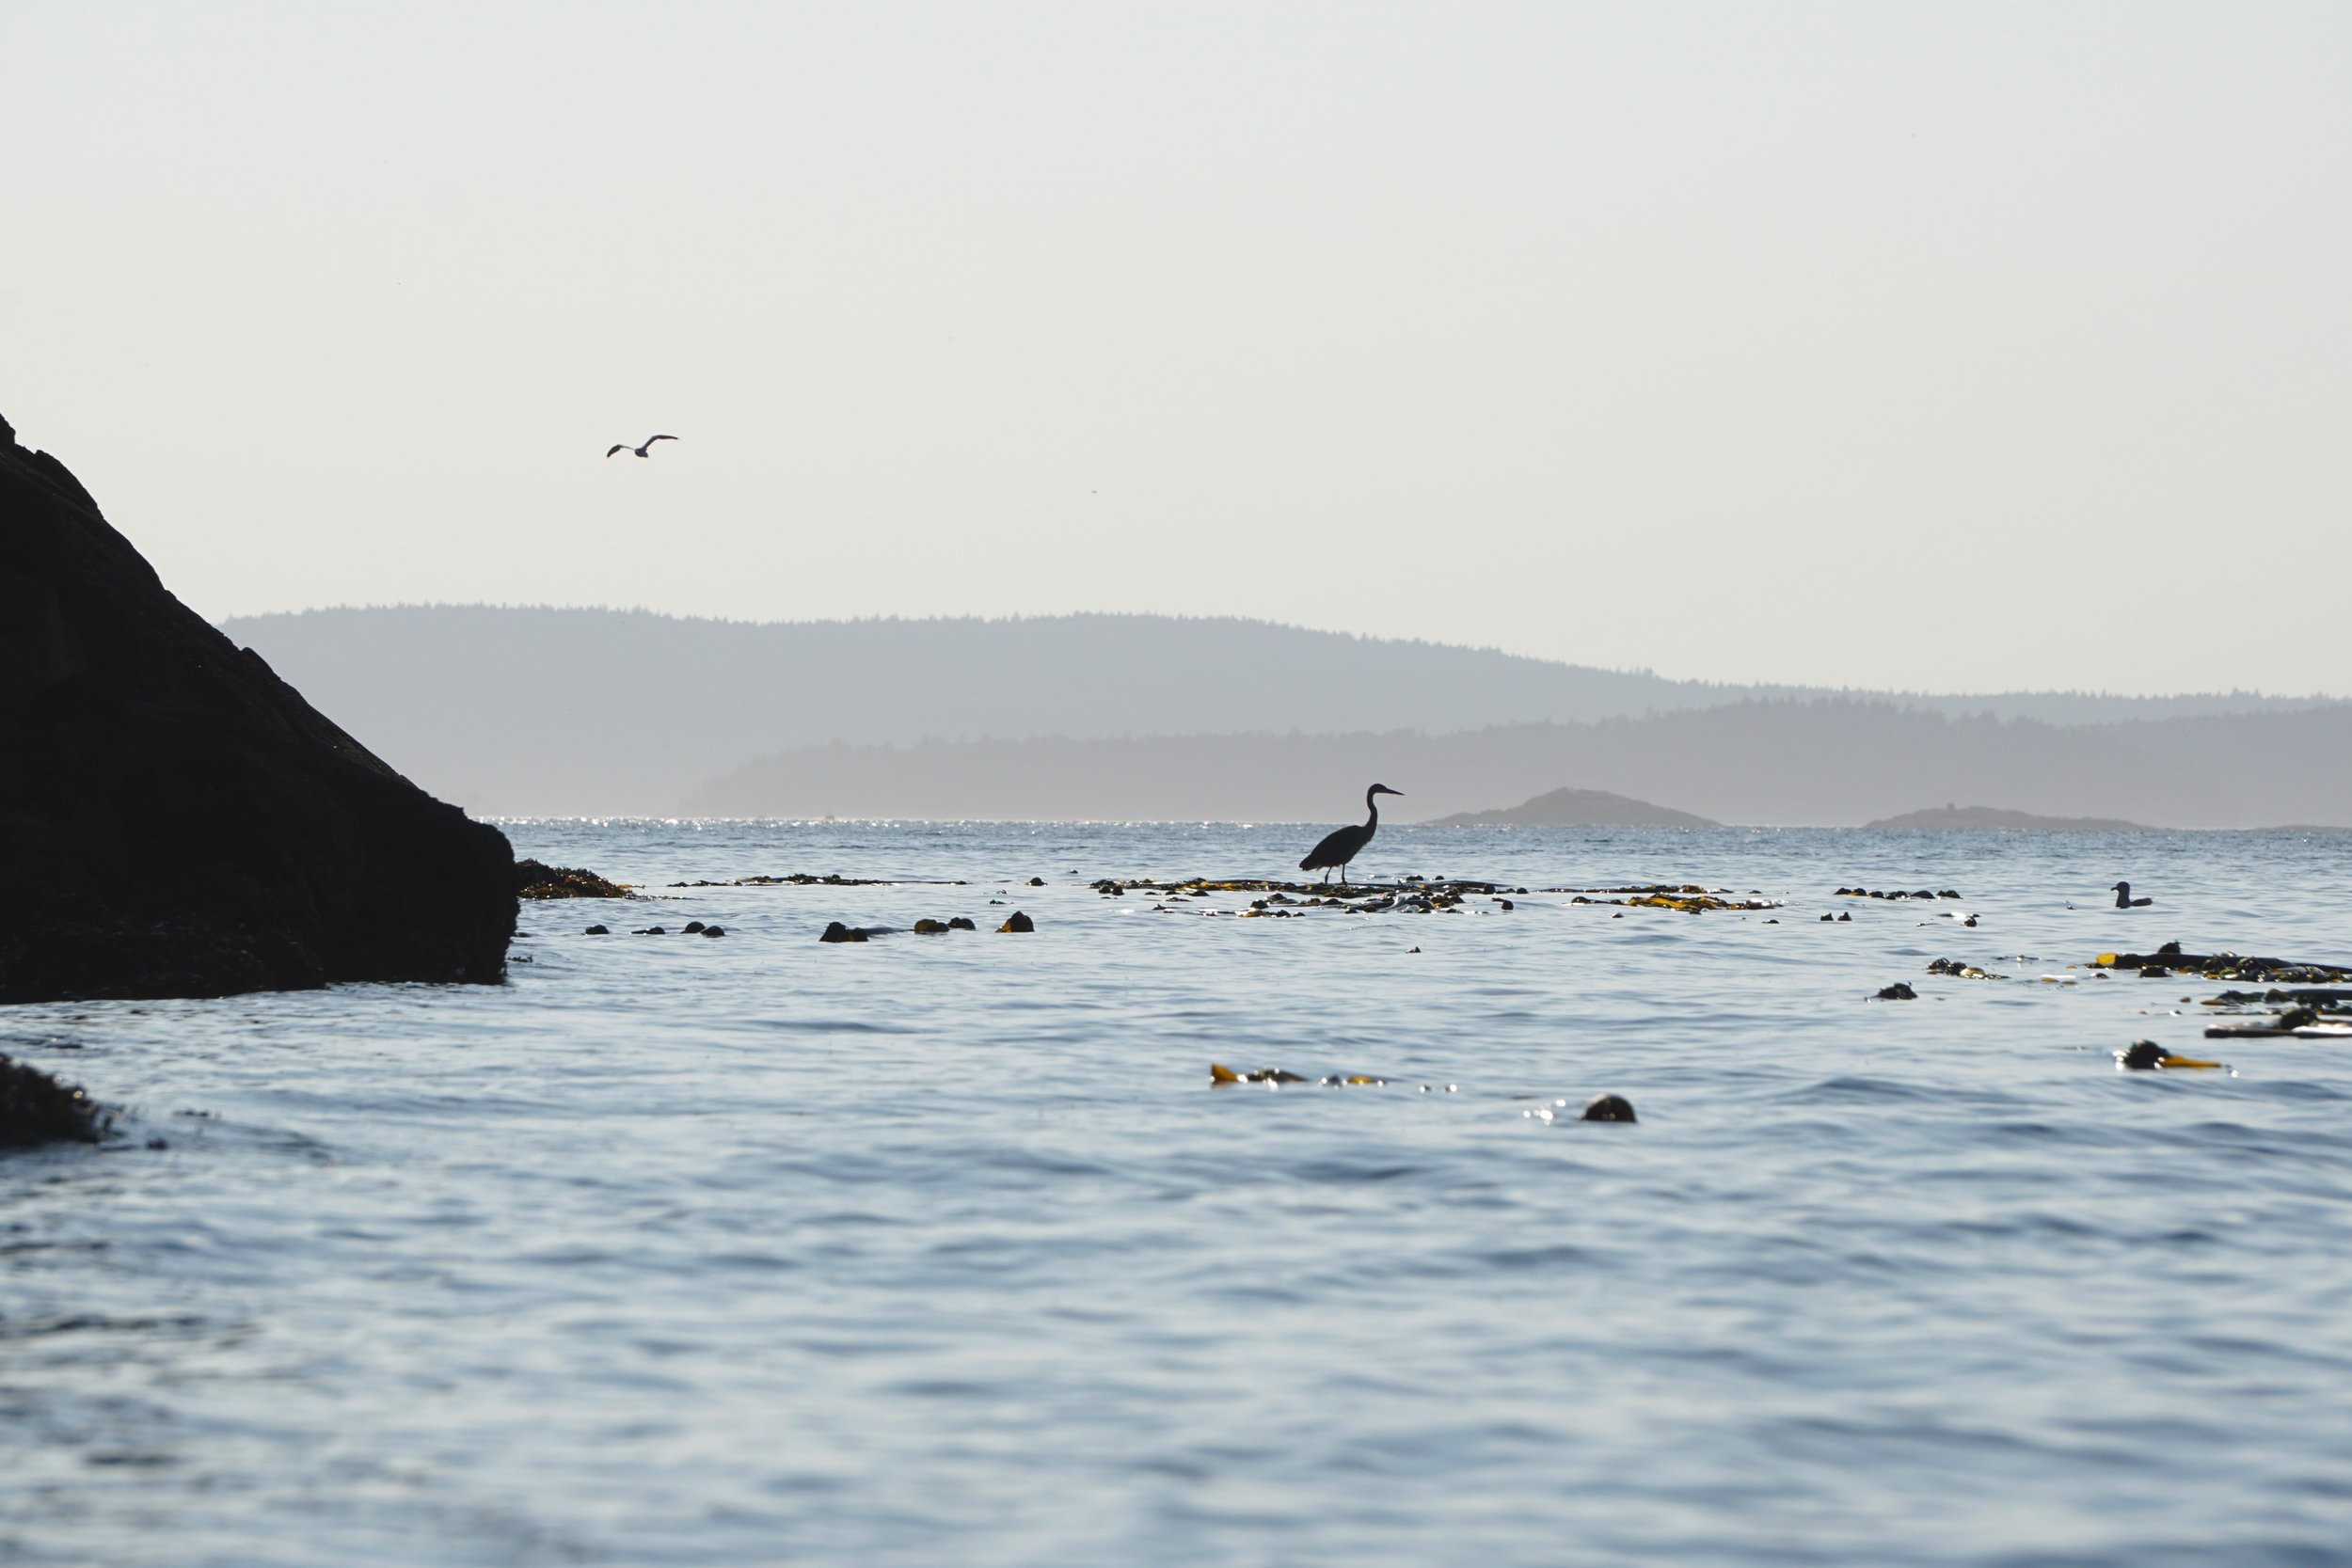 Heron spotted while kayaking